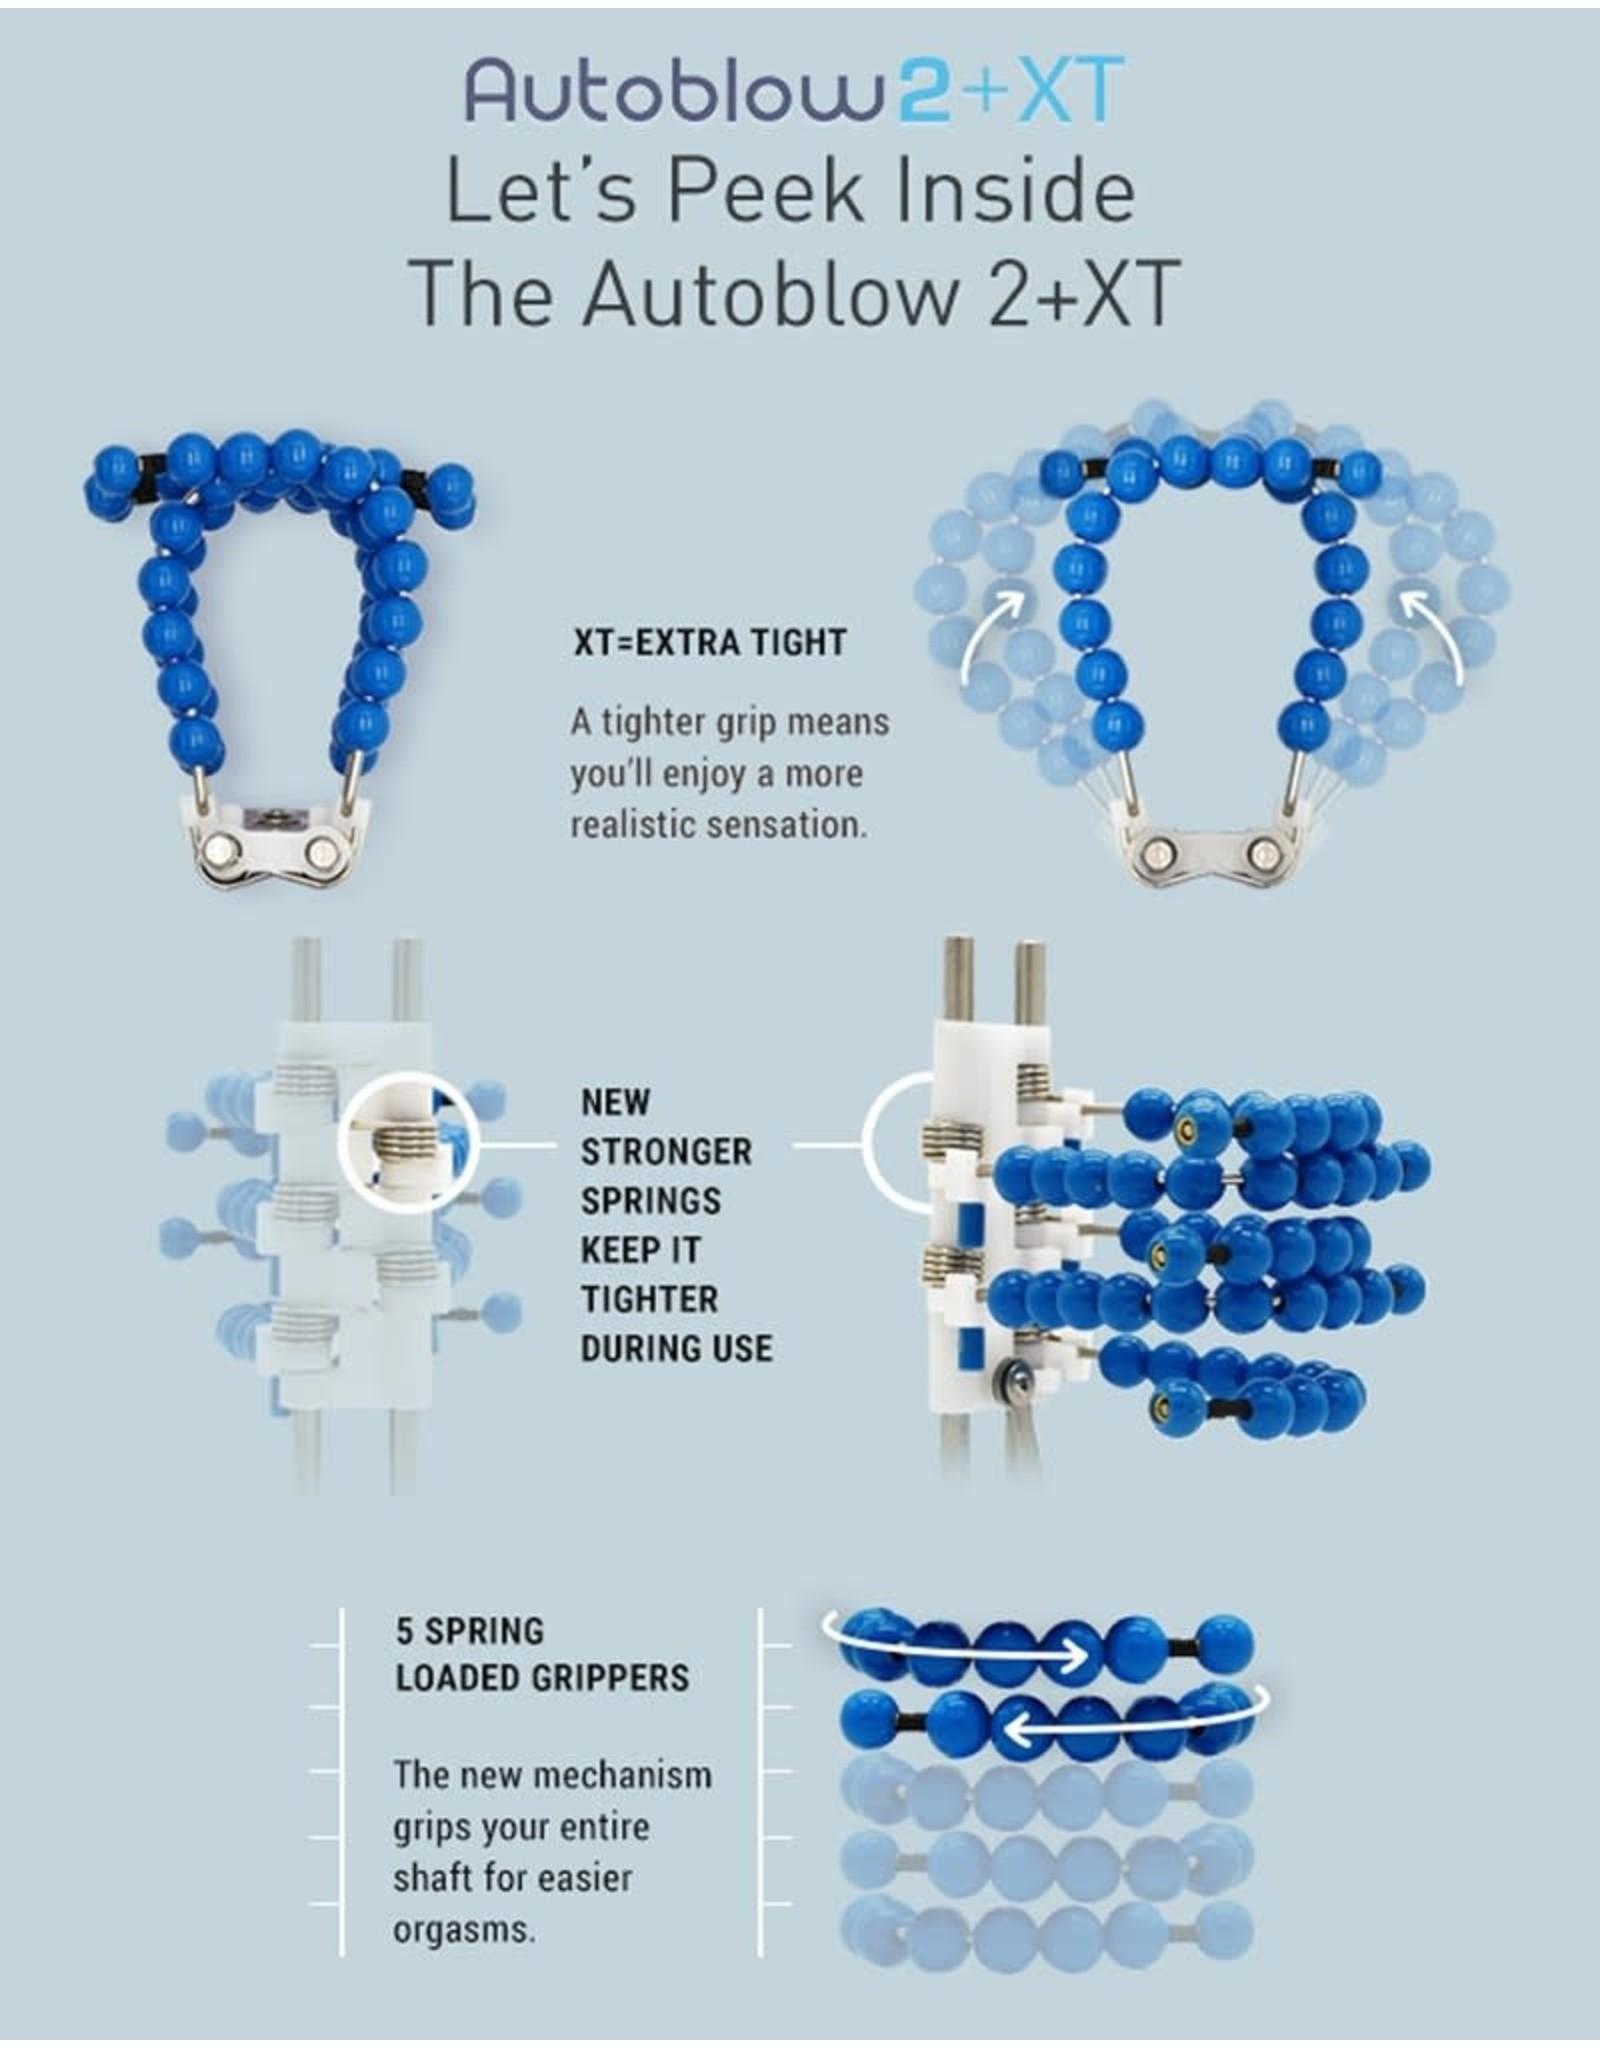 AUTOBLOW AUTOBLOW2+ - EXTRA TIGHT EDITION - SIZE B